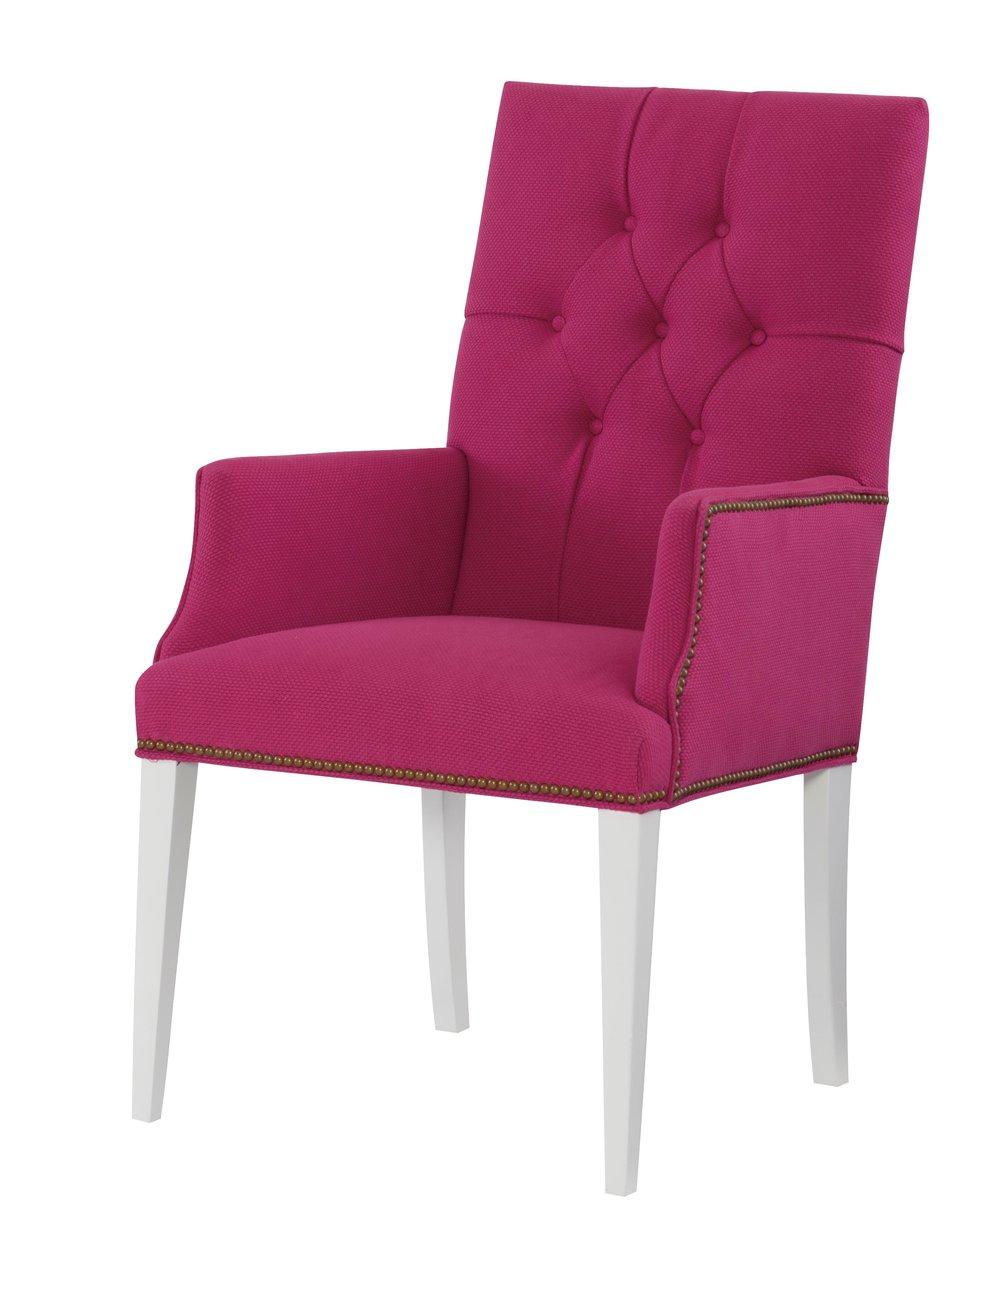 Century Furniture Fairmont Tufted Armchair, $1,595